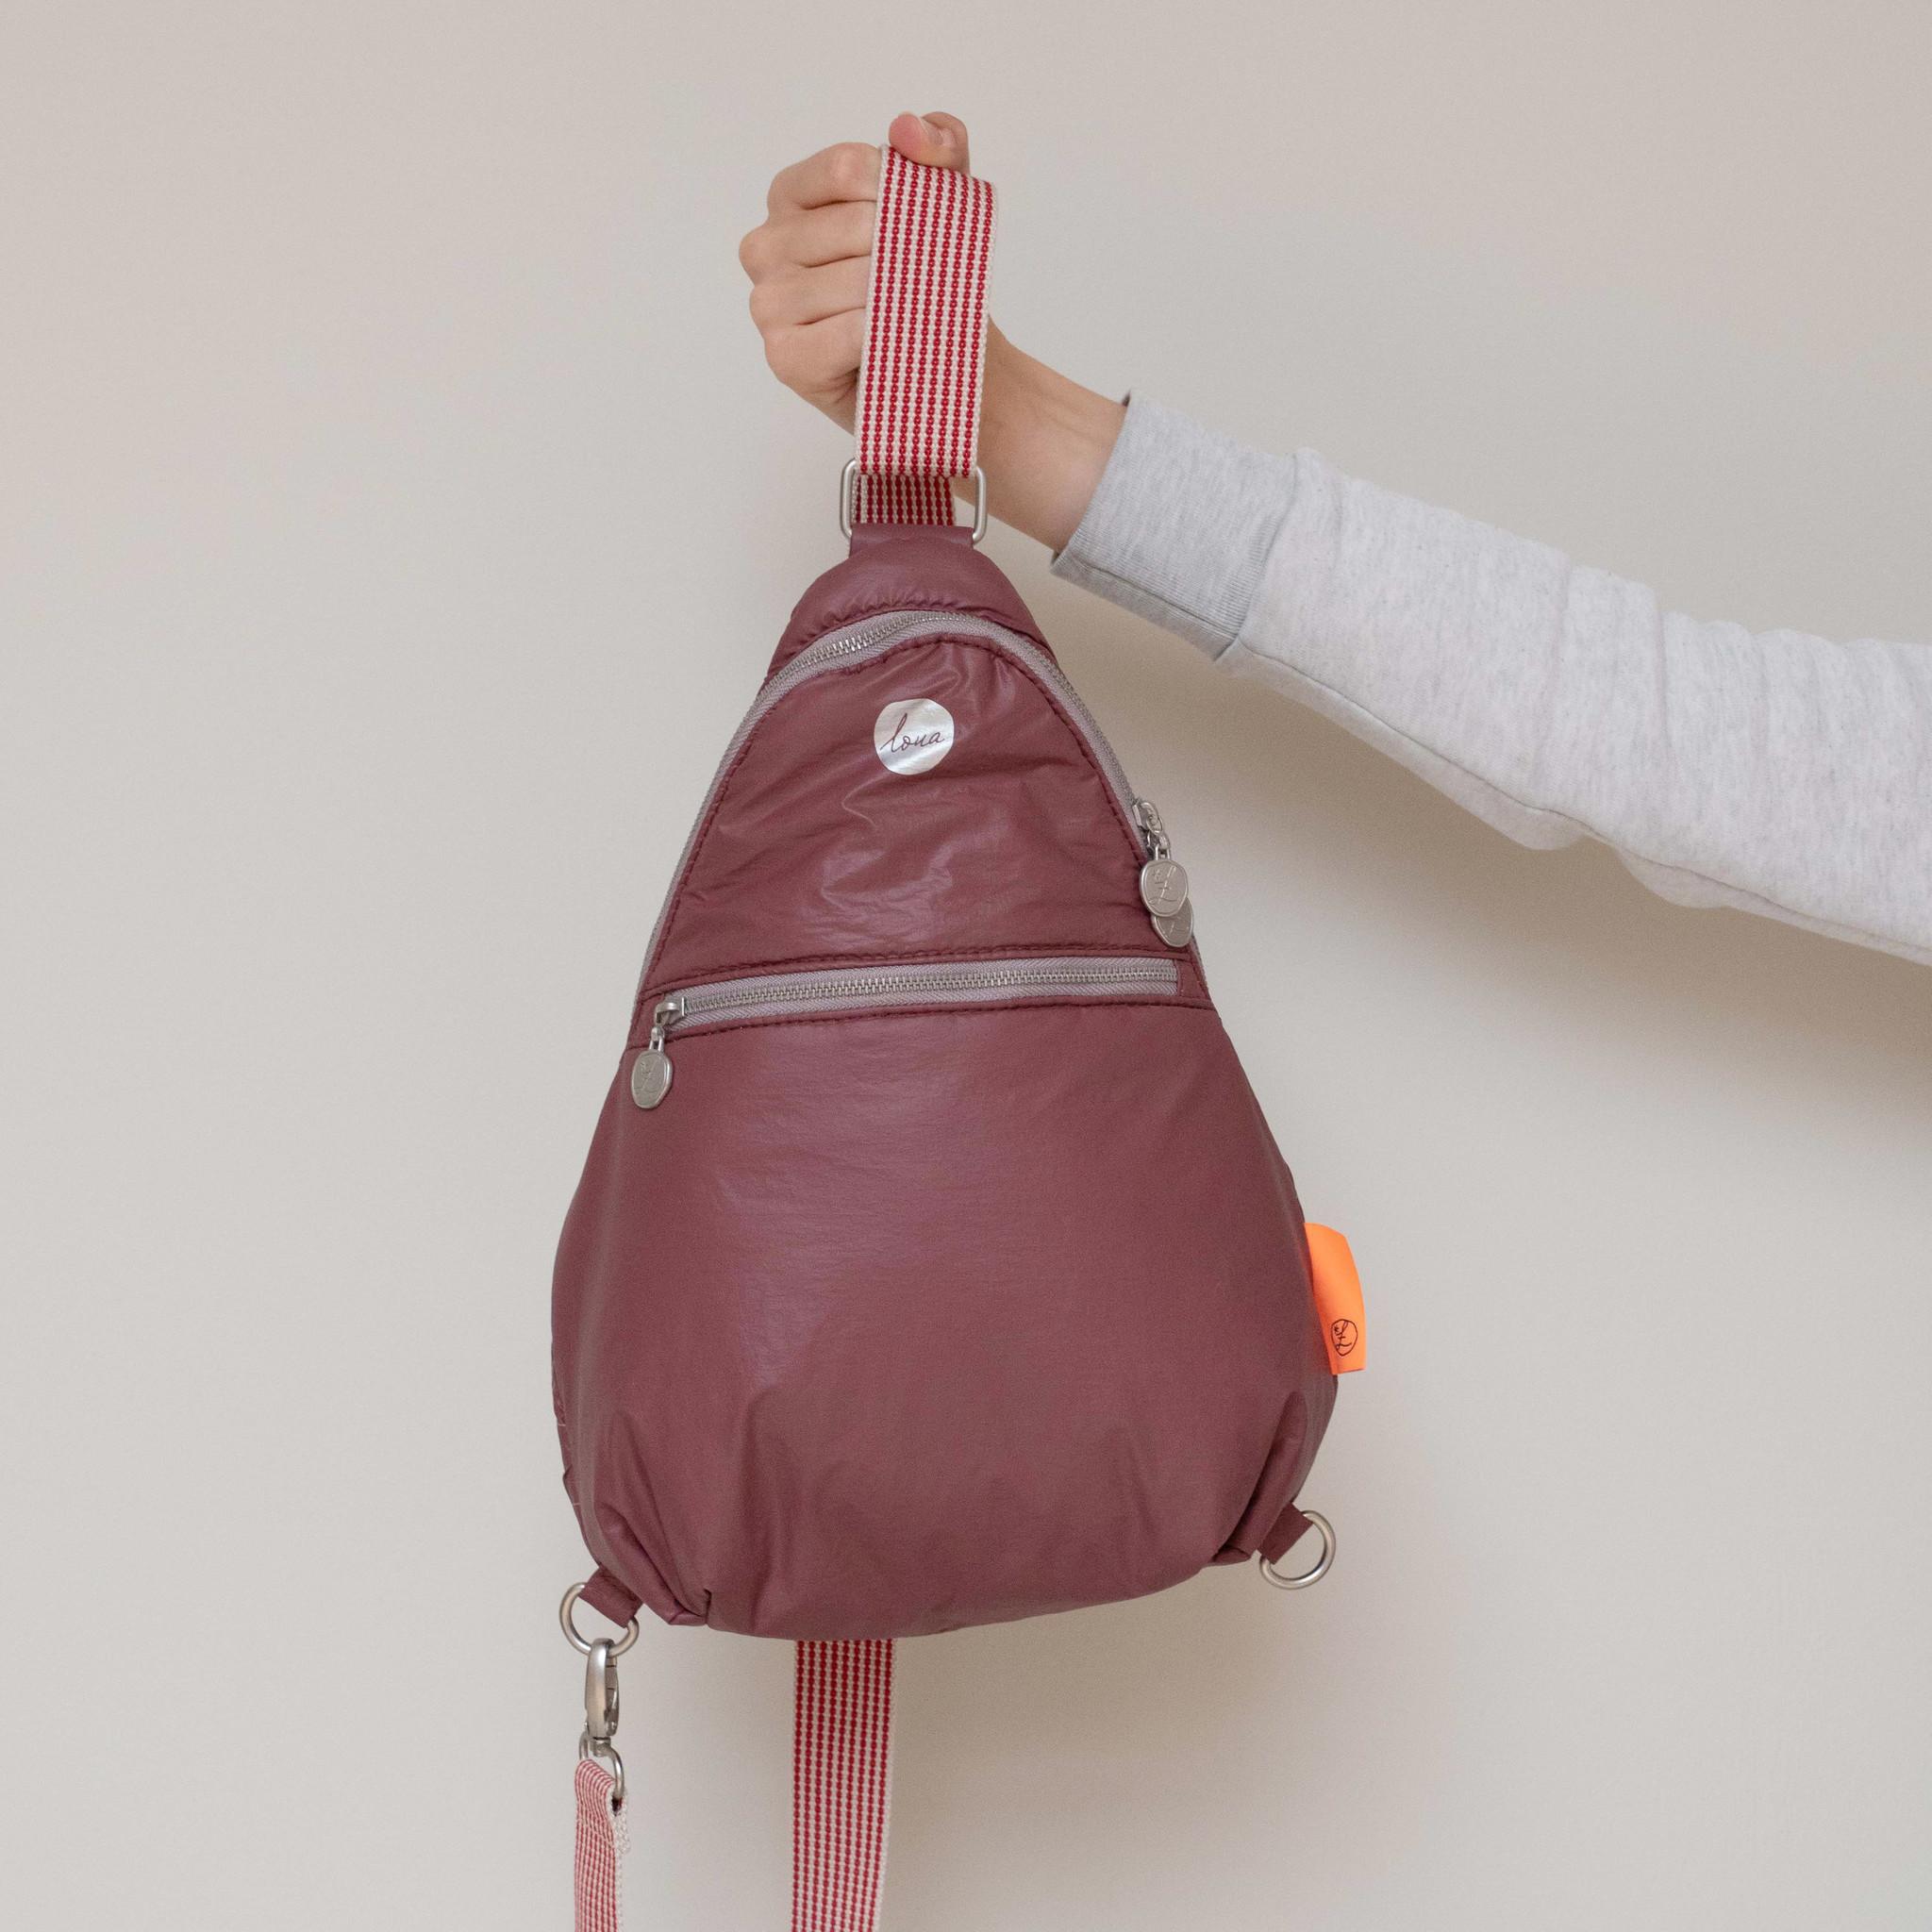 Loua - Drip Bag - Wild ginger (5 pcs.)-1